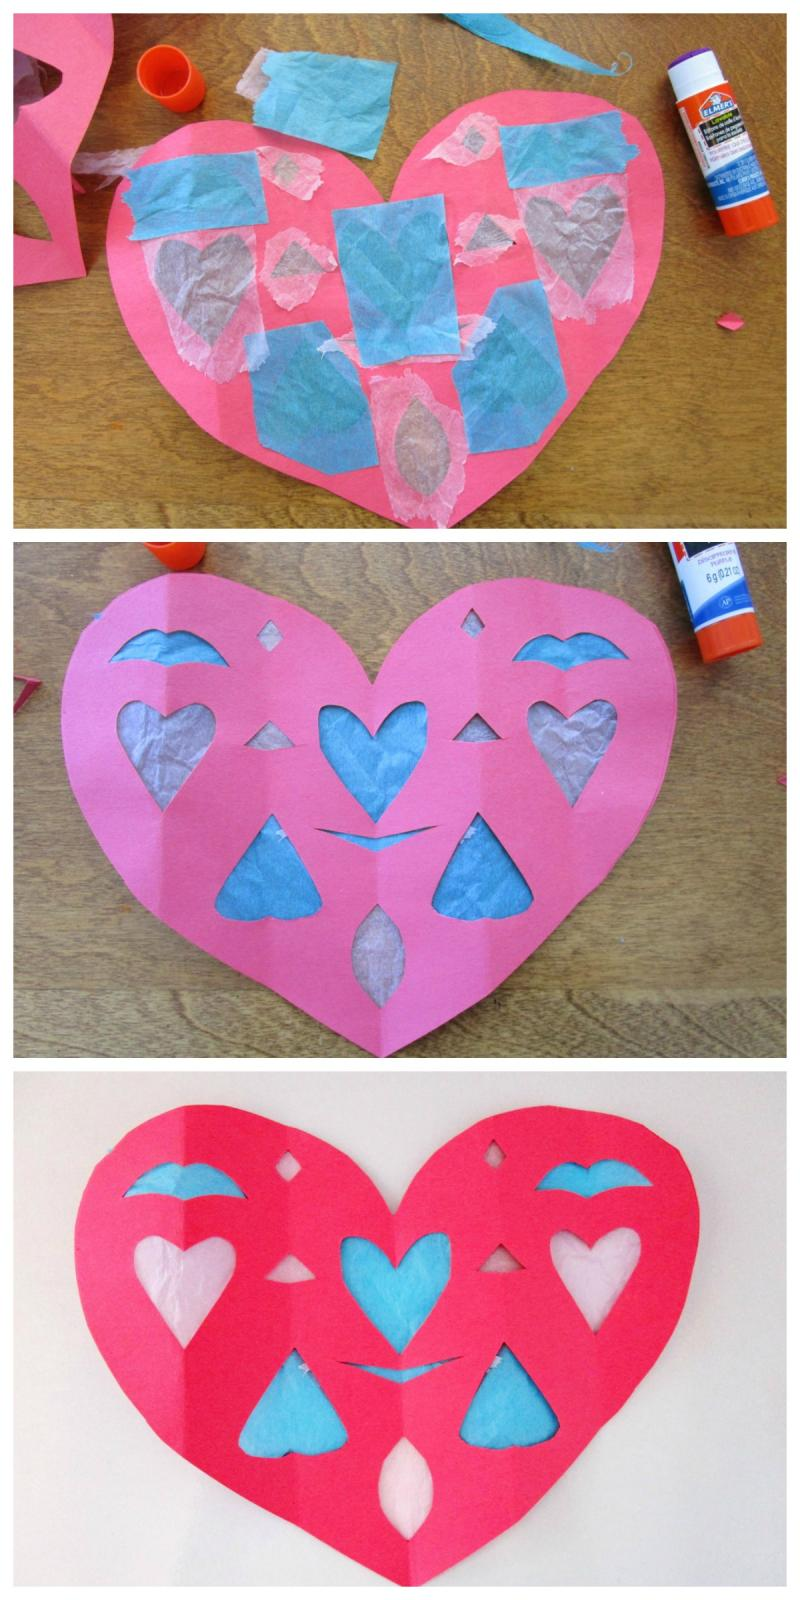 Paper Heart Decorations : paper, heart, decorations, Paper, Heart, Window, Decorations, YummyMummyClub.ca